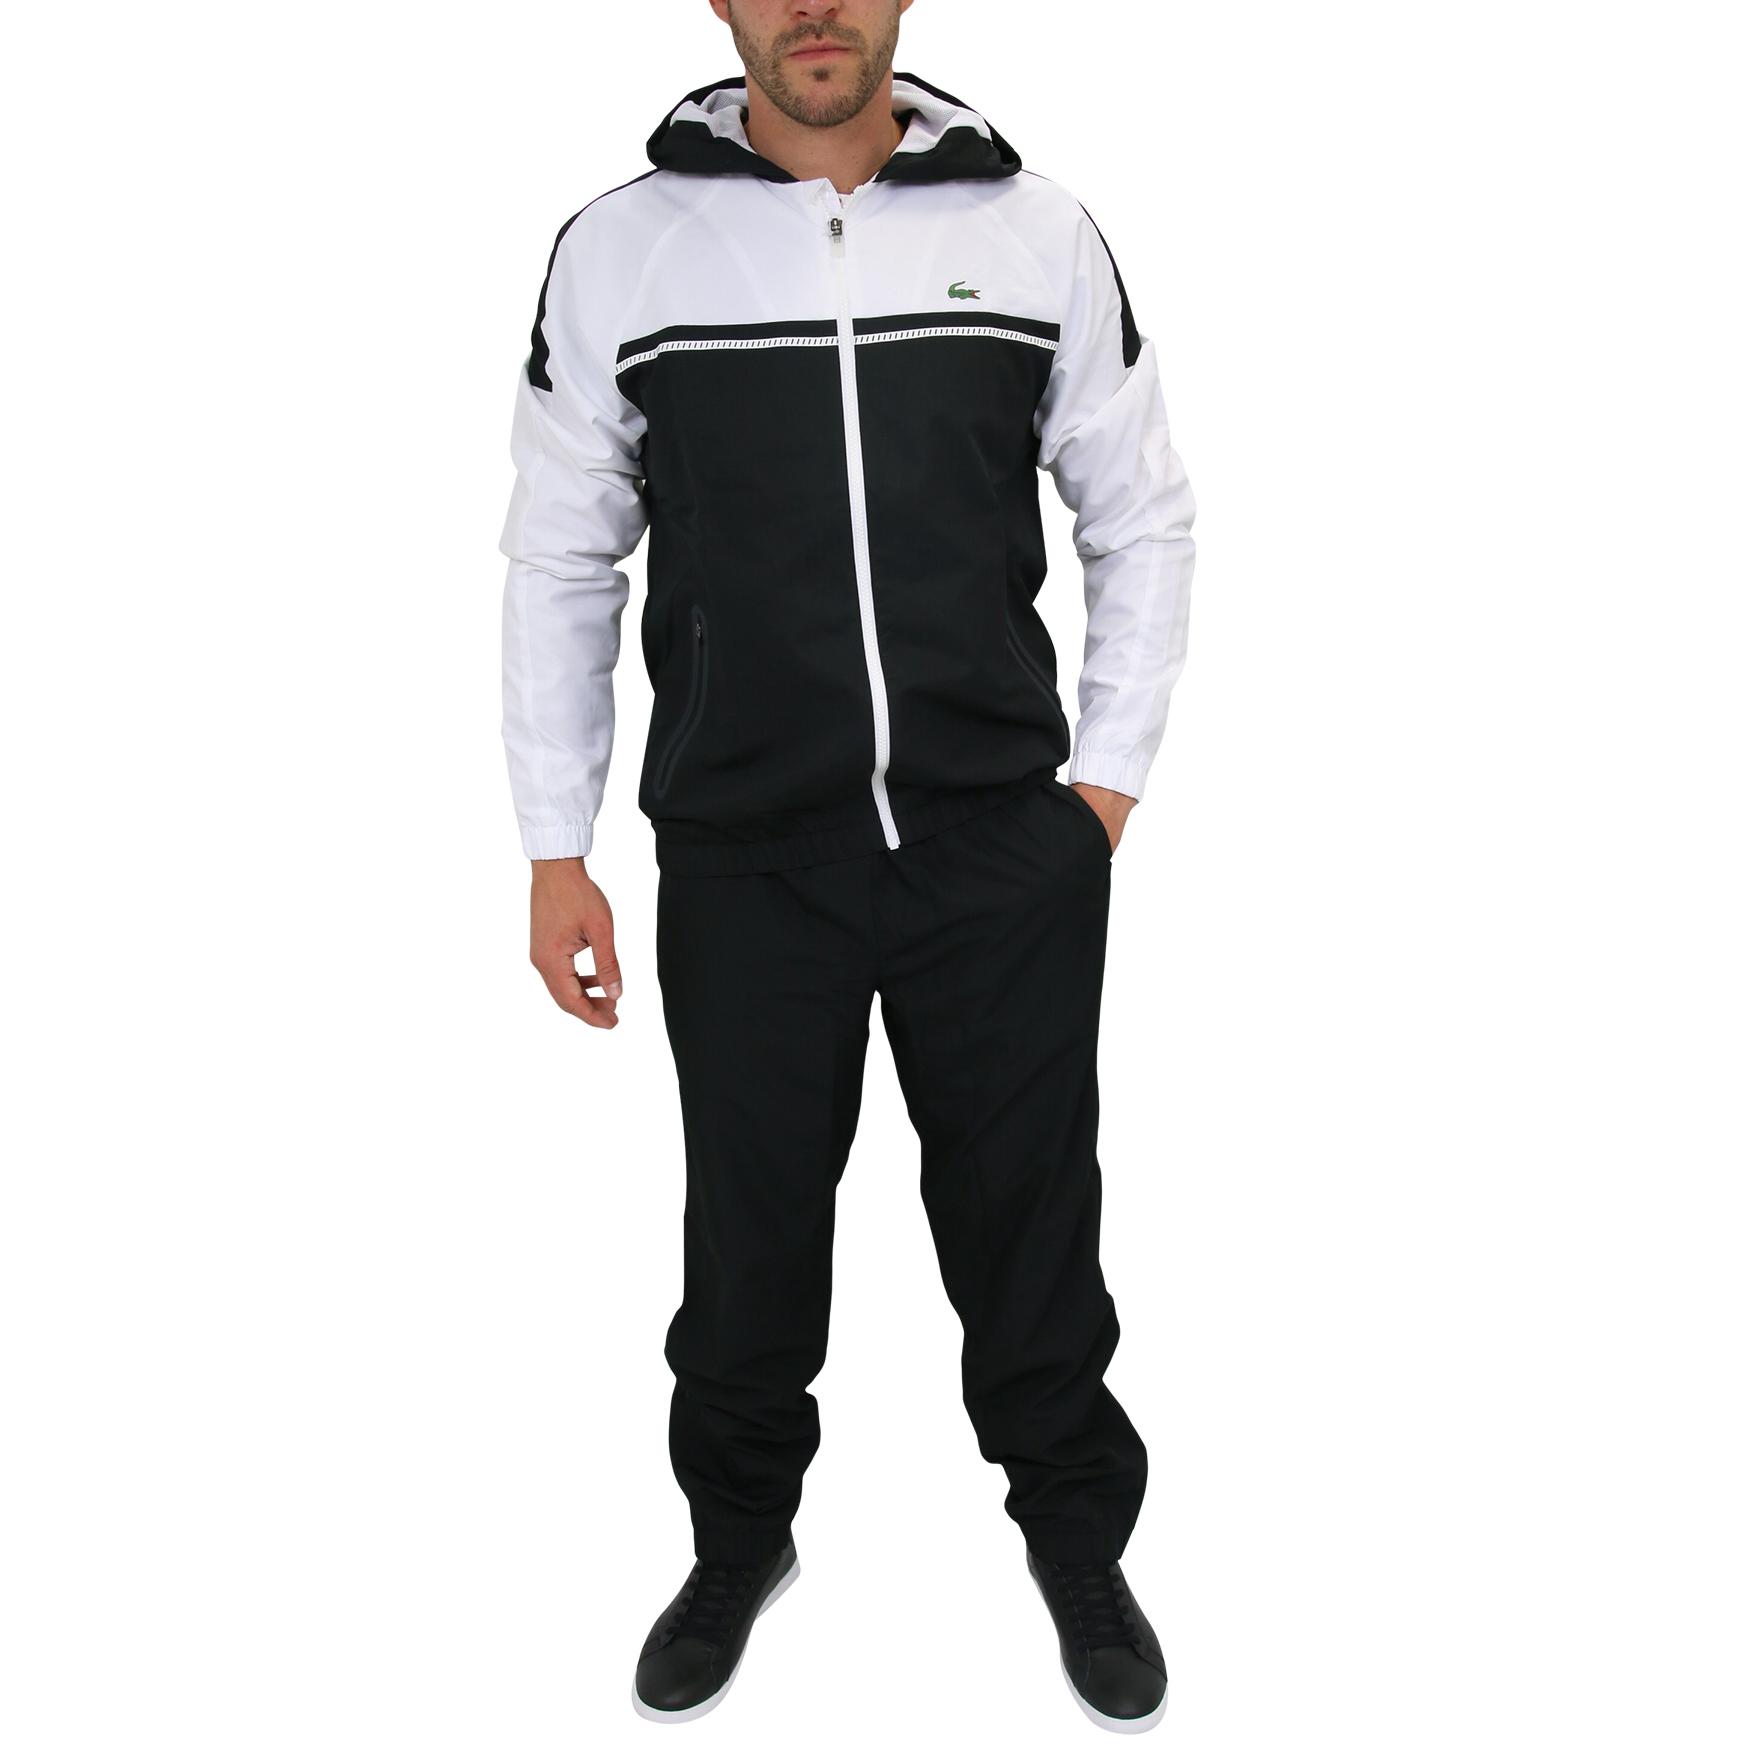 lacoste sport trainingsanzug sportanzug jogginganzug tennis herren schwarz ebay. Black Bedroom Furniture Sets. Home Design Ideas